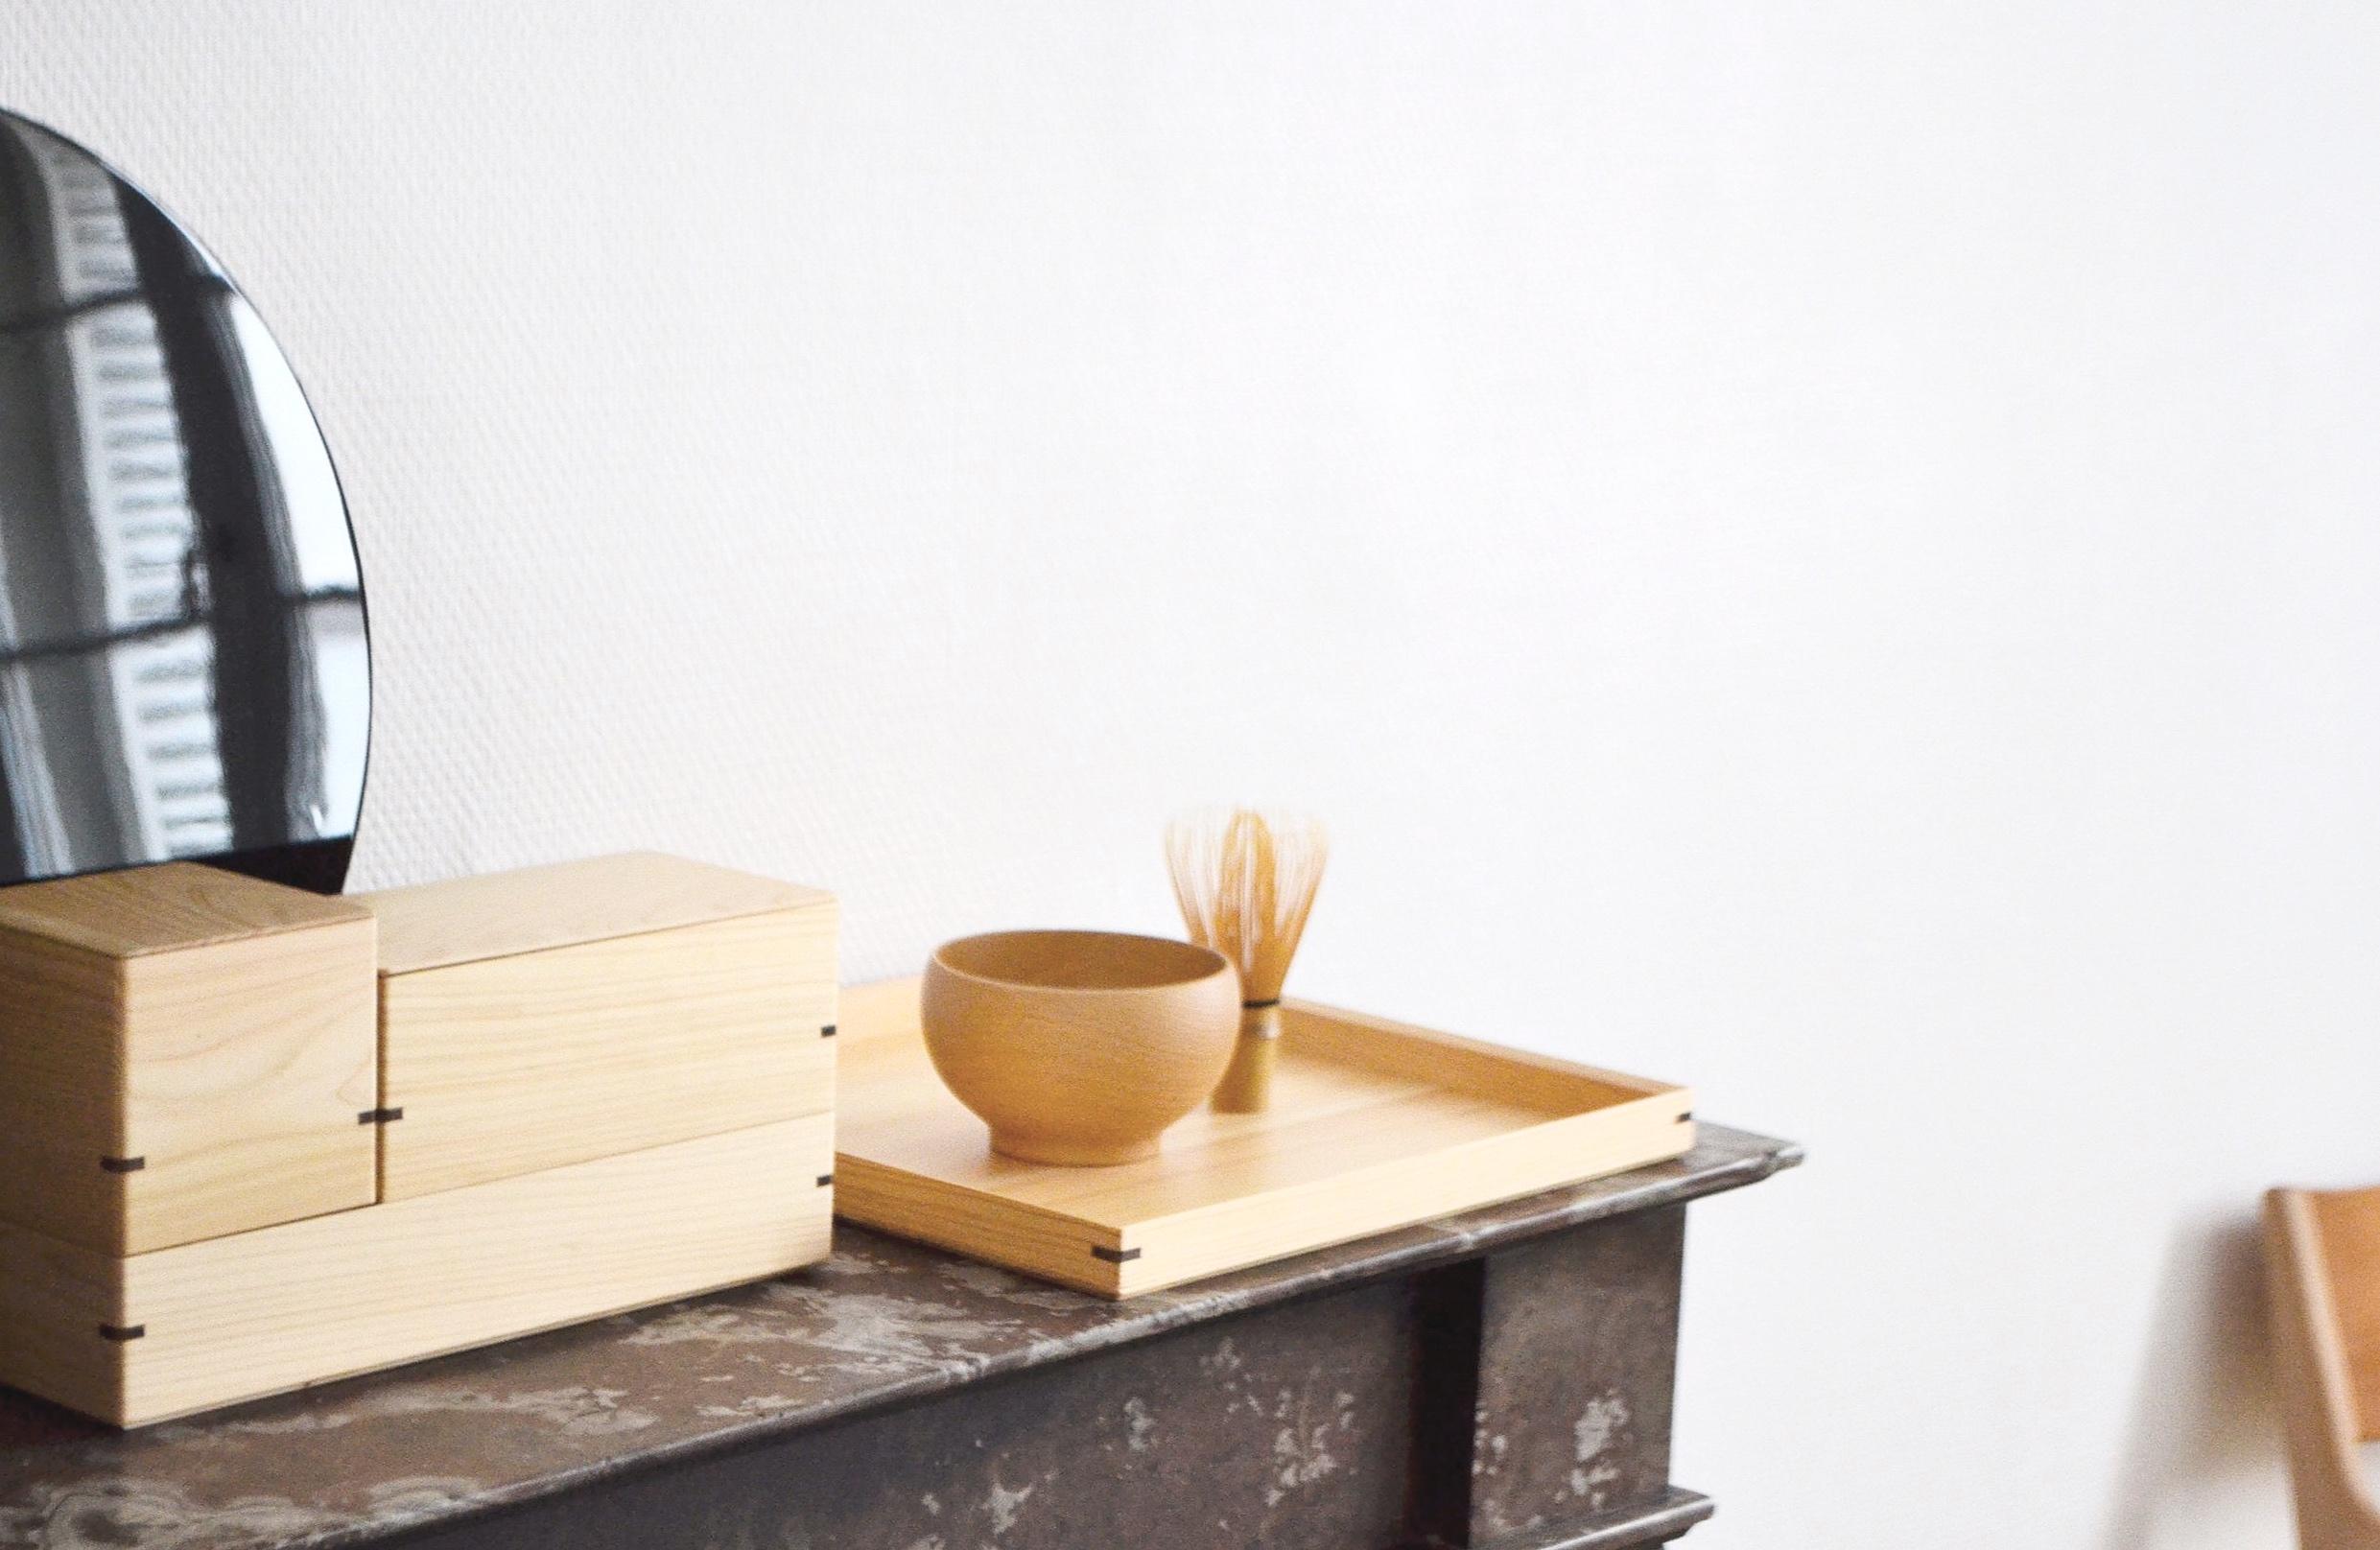 Atelier+Takumi+-+Boxes%3AHinoki%3AWoodwork%3AAssemblage%3AToyooka+Craft%3AFlavien+Delbergue%3ACompo5.jpg